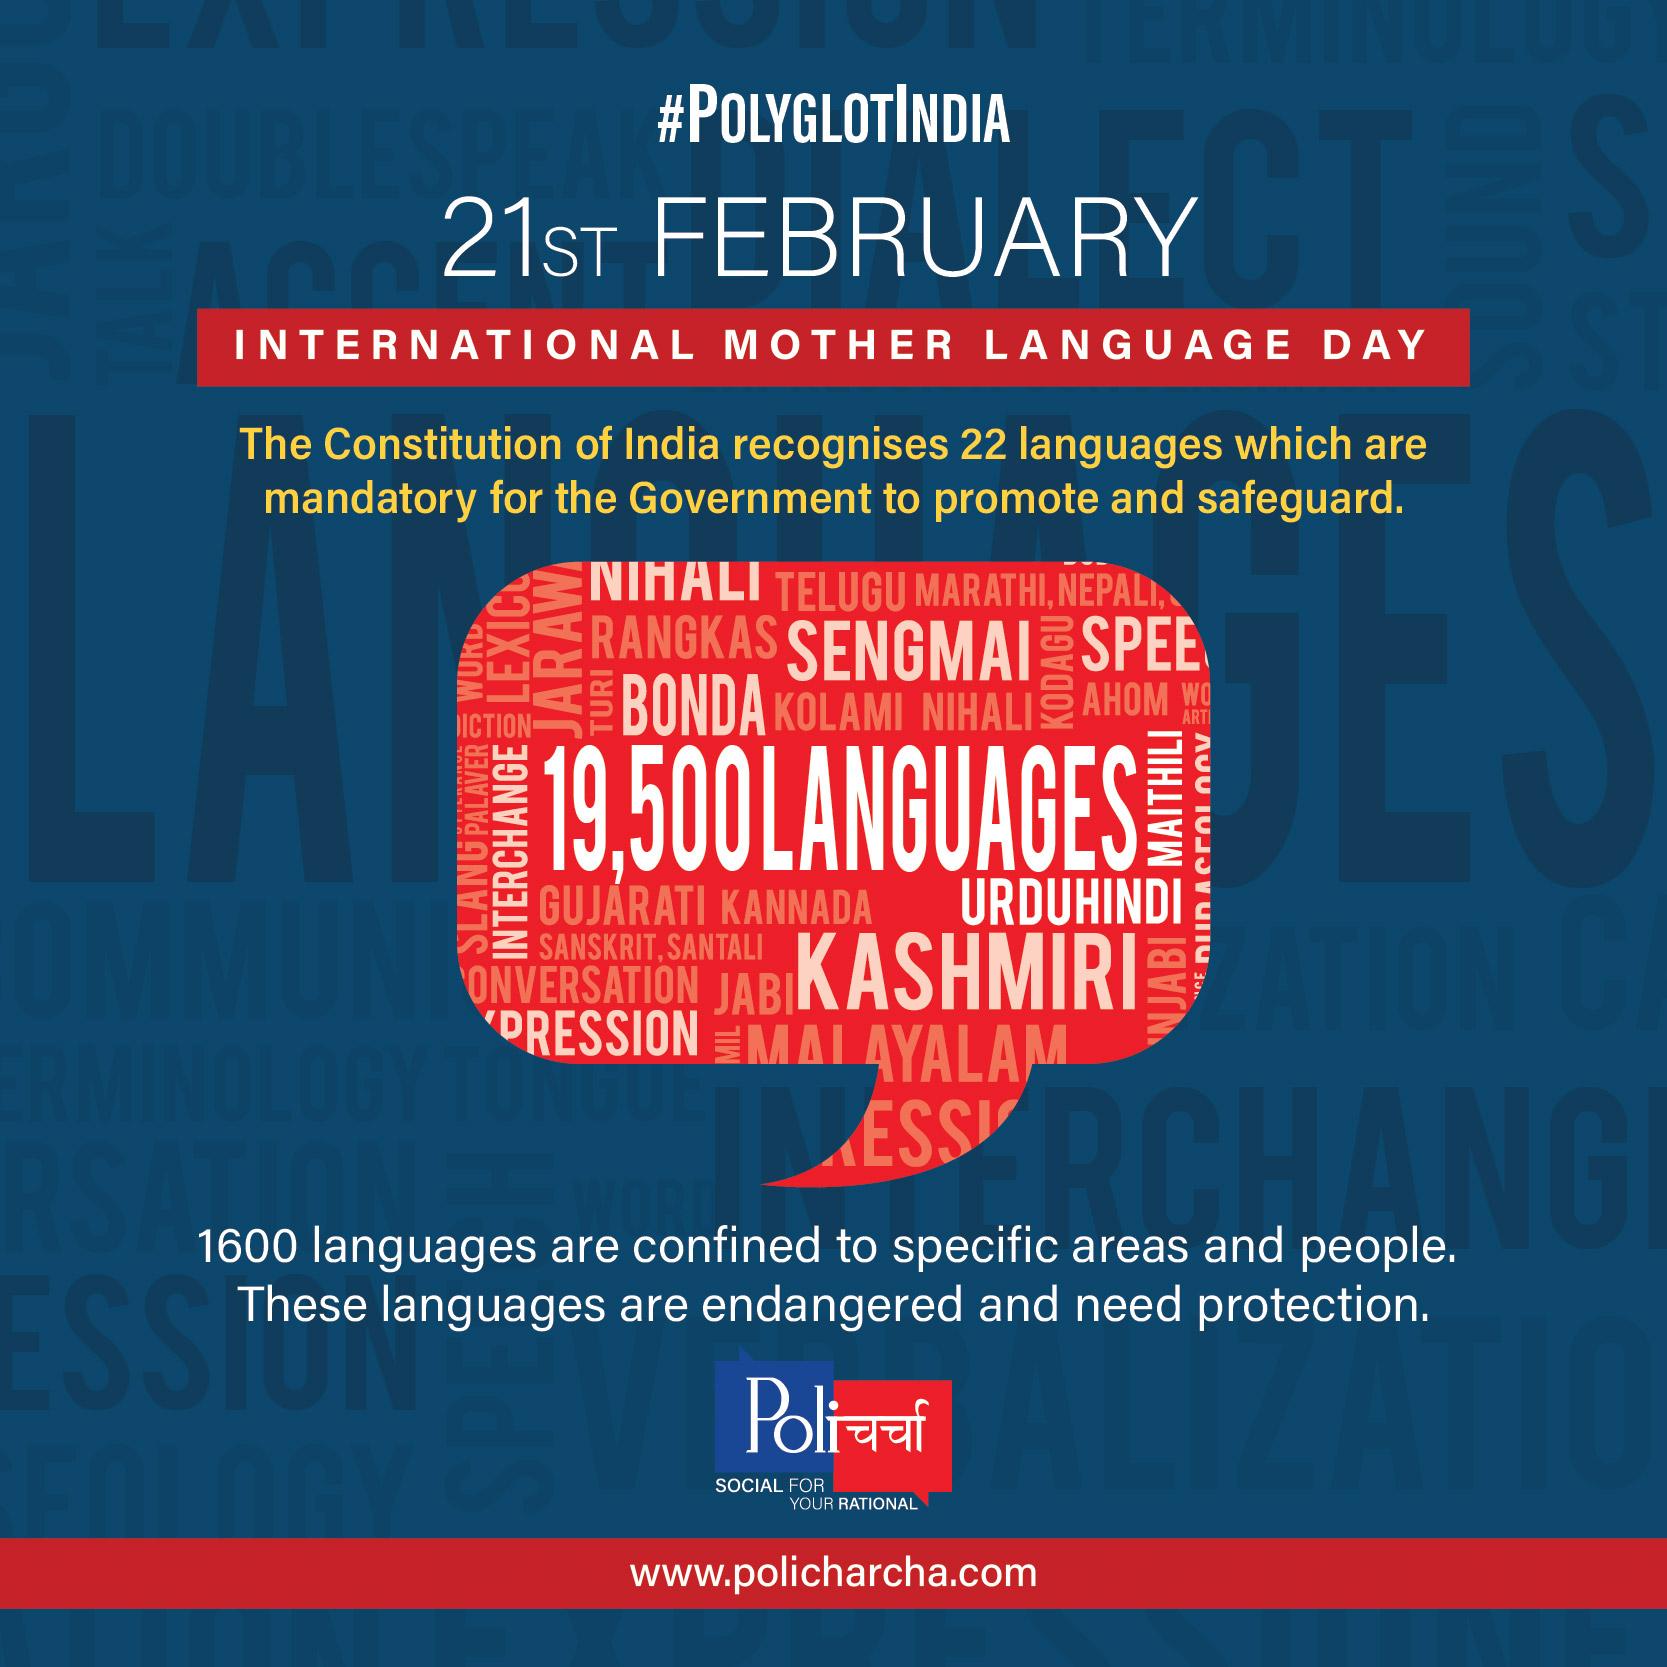 #PolyglotIndia - The linguistic diversity of India